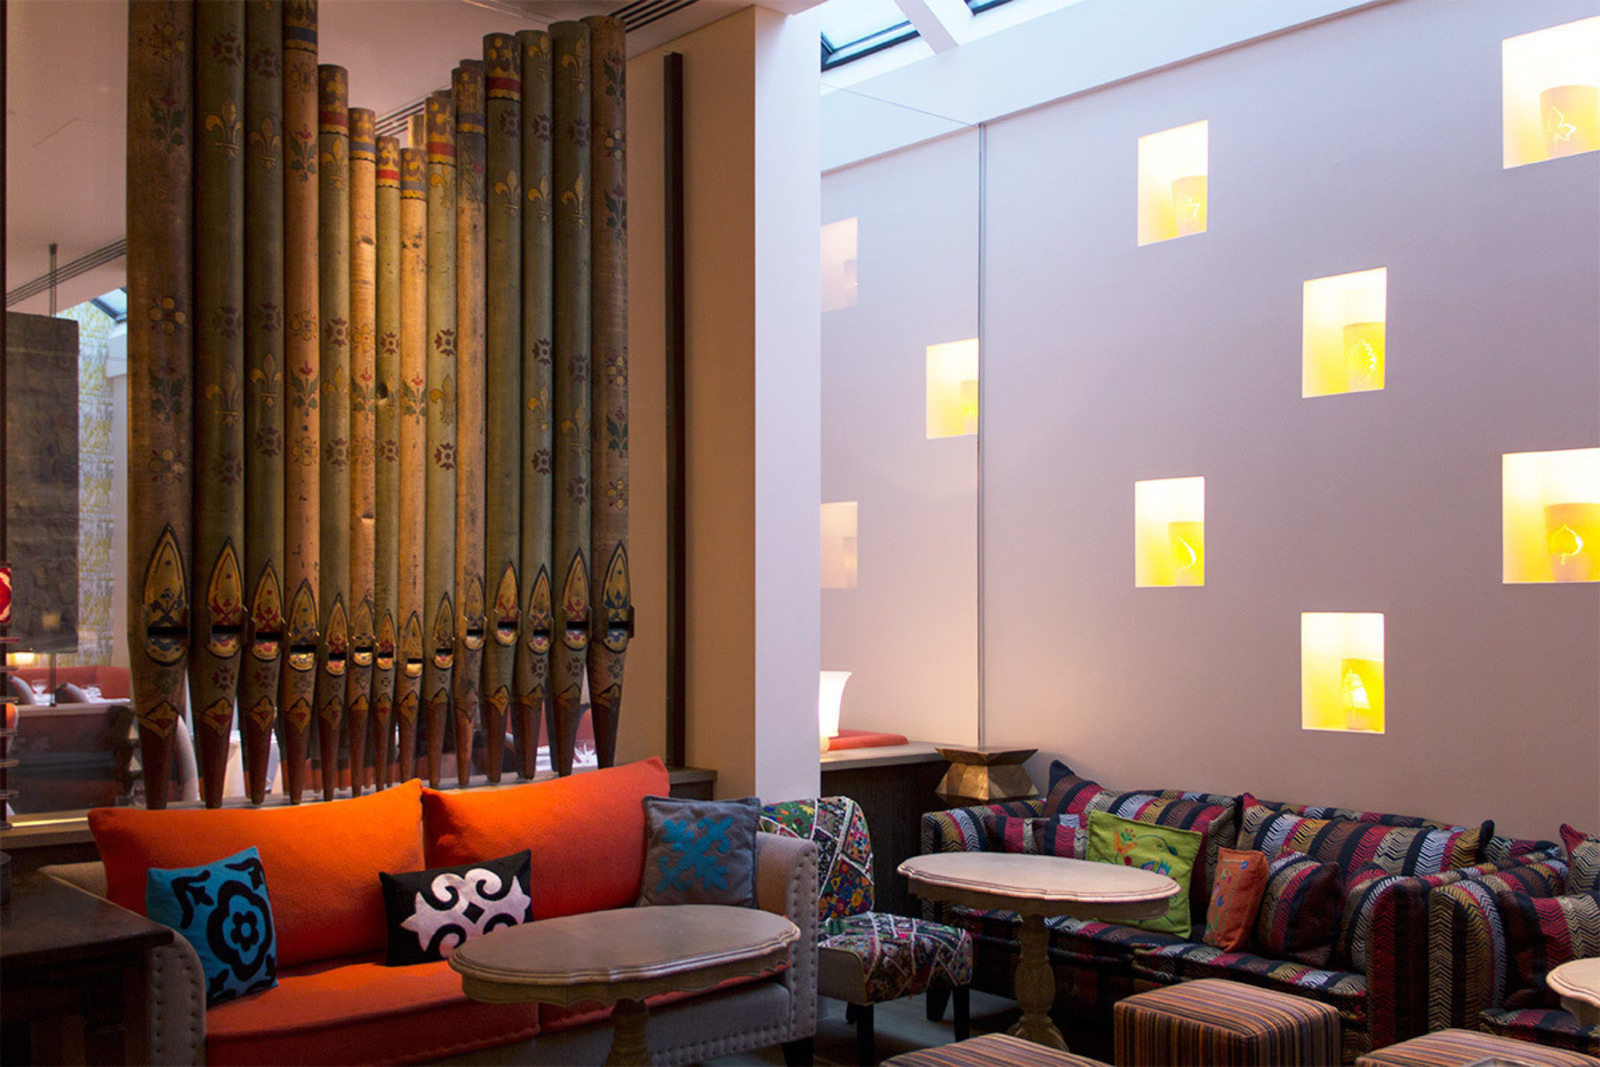 large_ham-yard-hotel-cool-hunting-review-london-boutique-design-soho.jpg